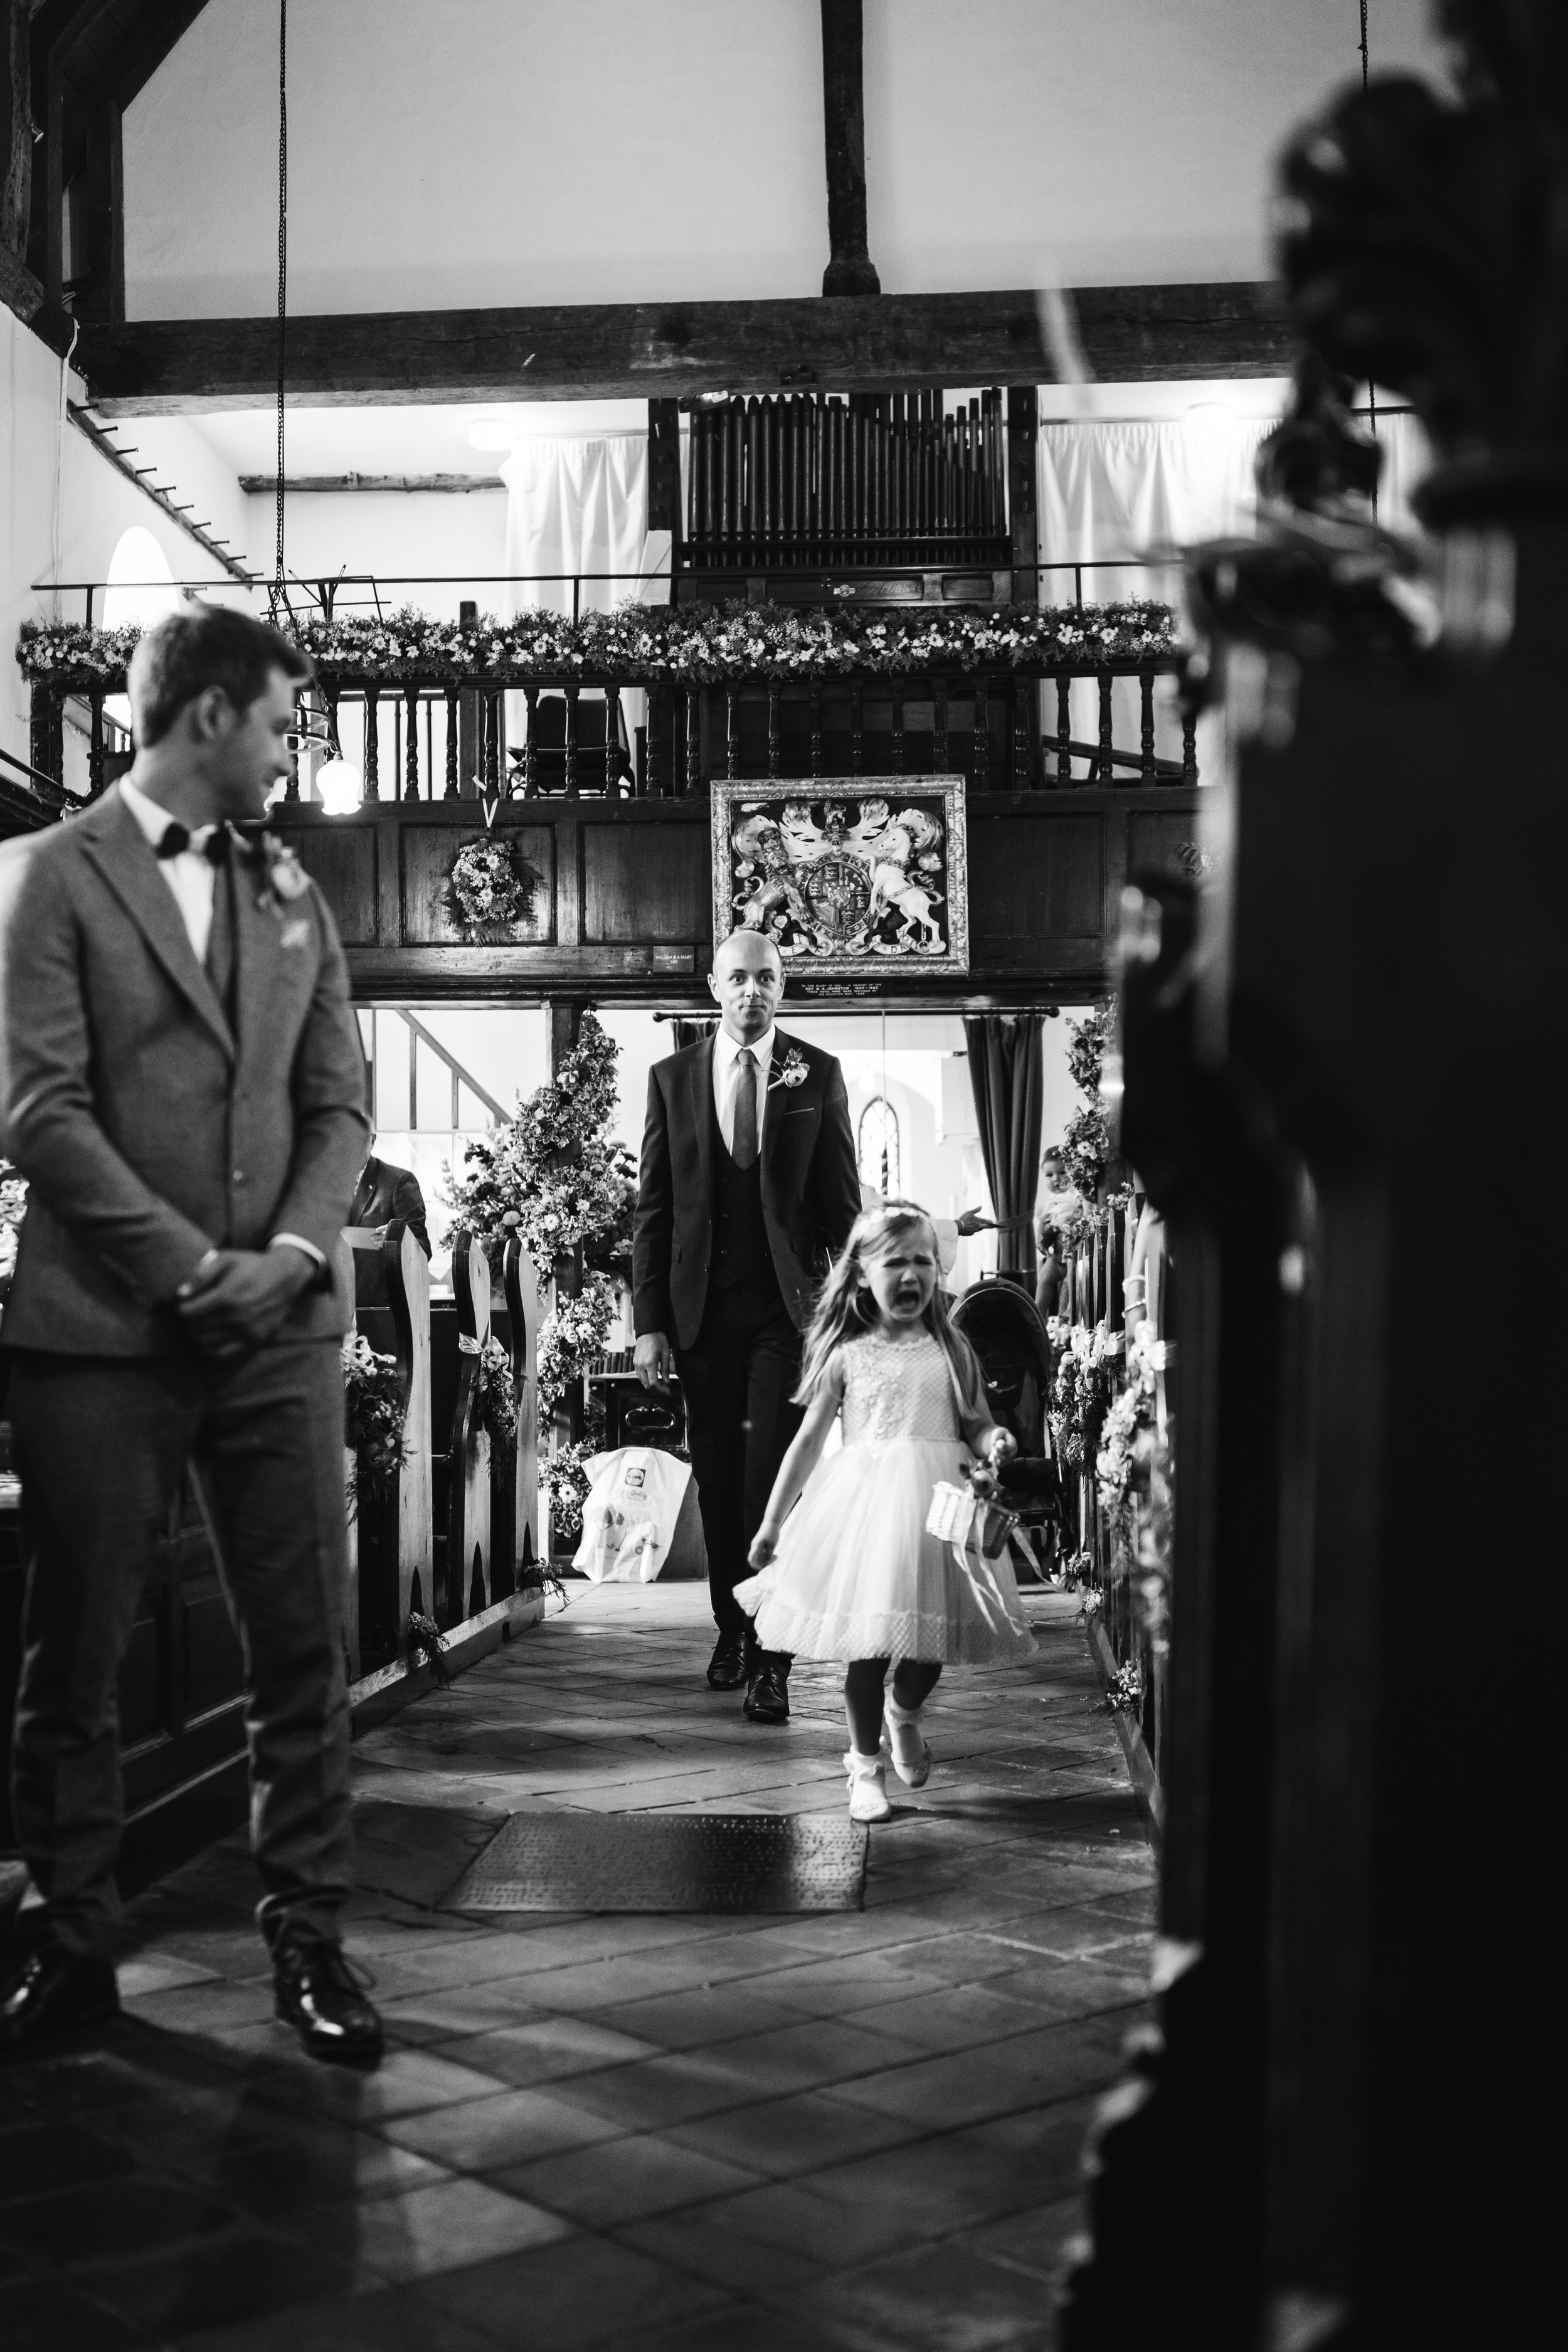 kent-wedding-photographer-08166.jpg